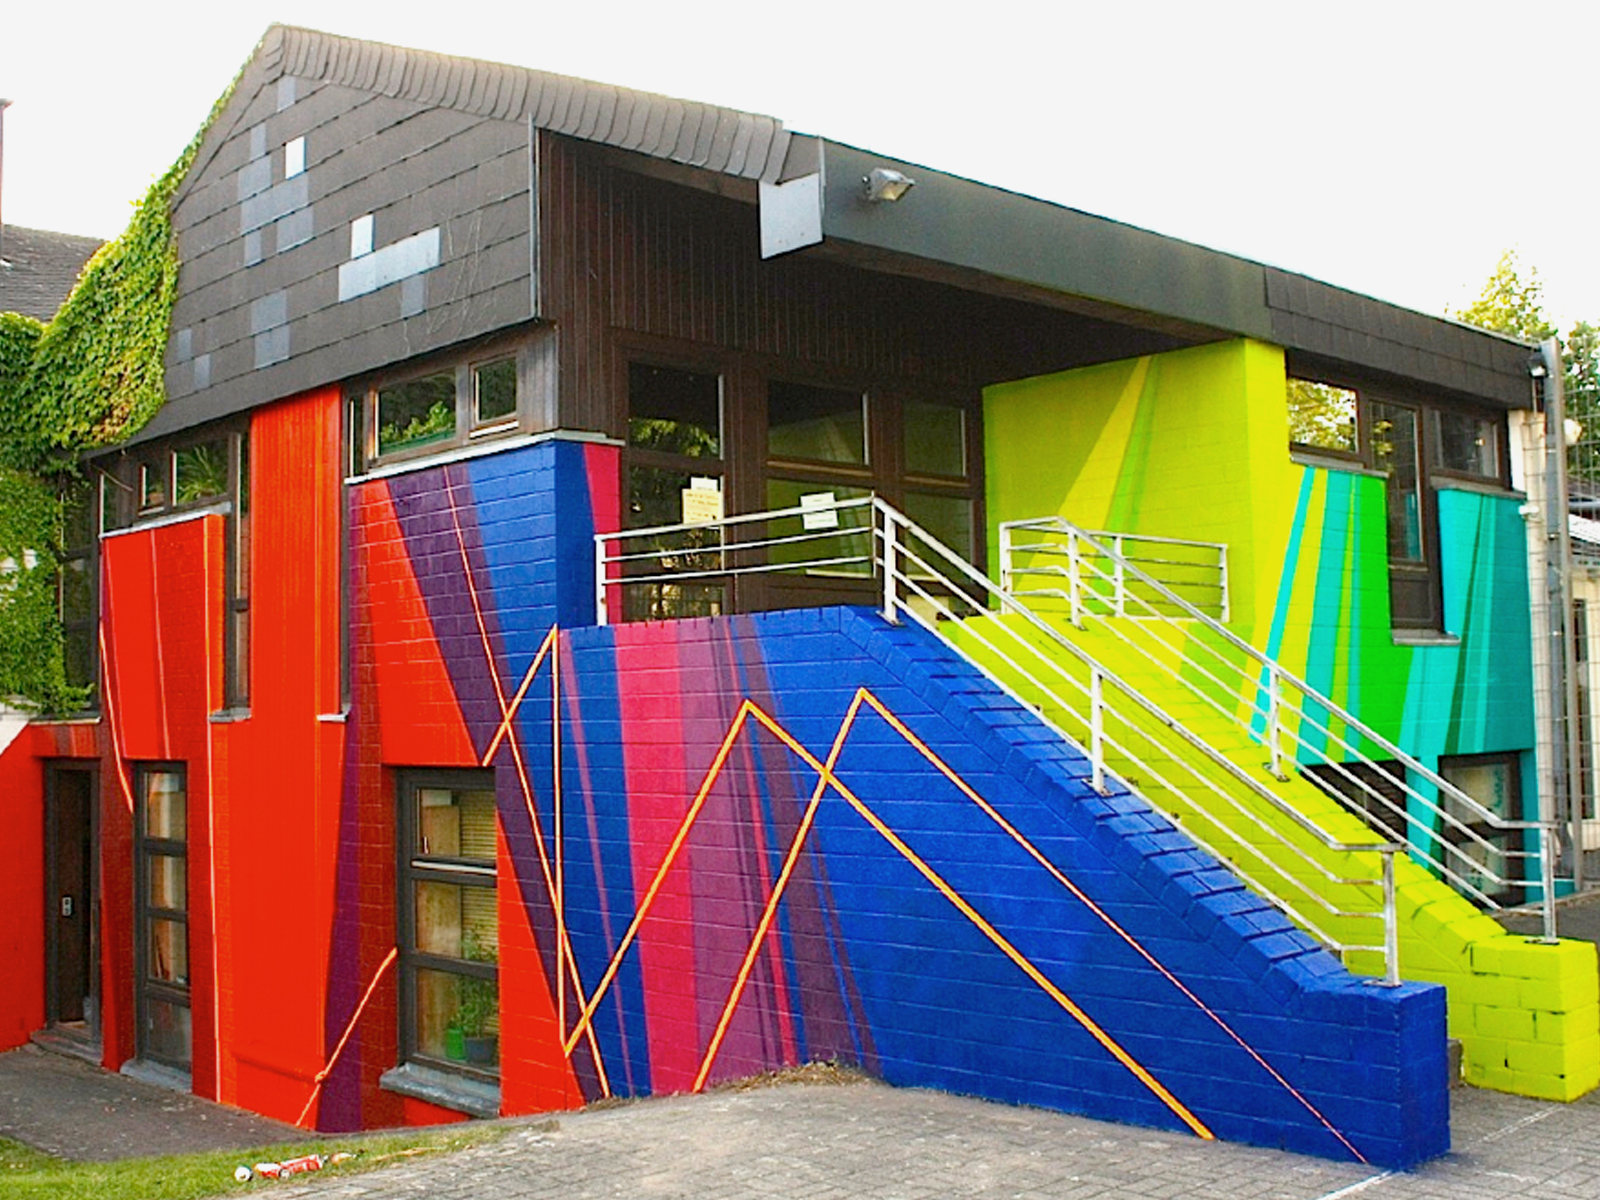 haus,graffiti,Wandgestaltung,Kraftwerksschule,essen,düsseldorf,2014,graffiti,fassadengestaltung,graffitikuenstler,graffitiagentur,graffiti studio,berlin